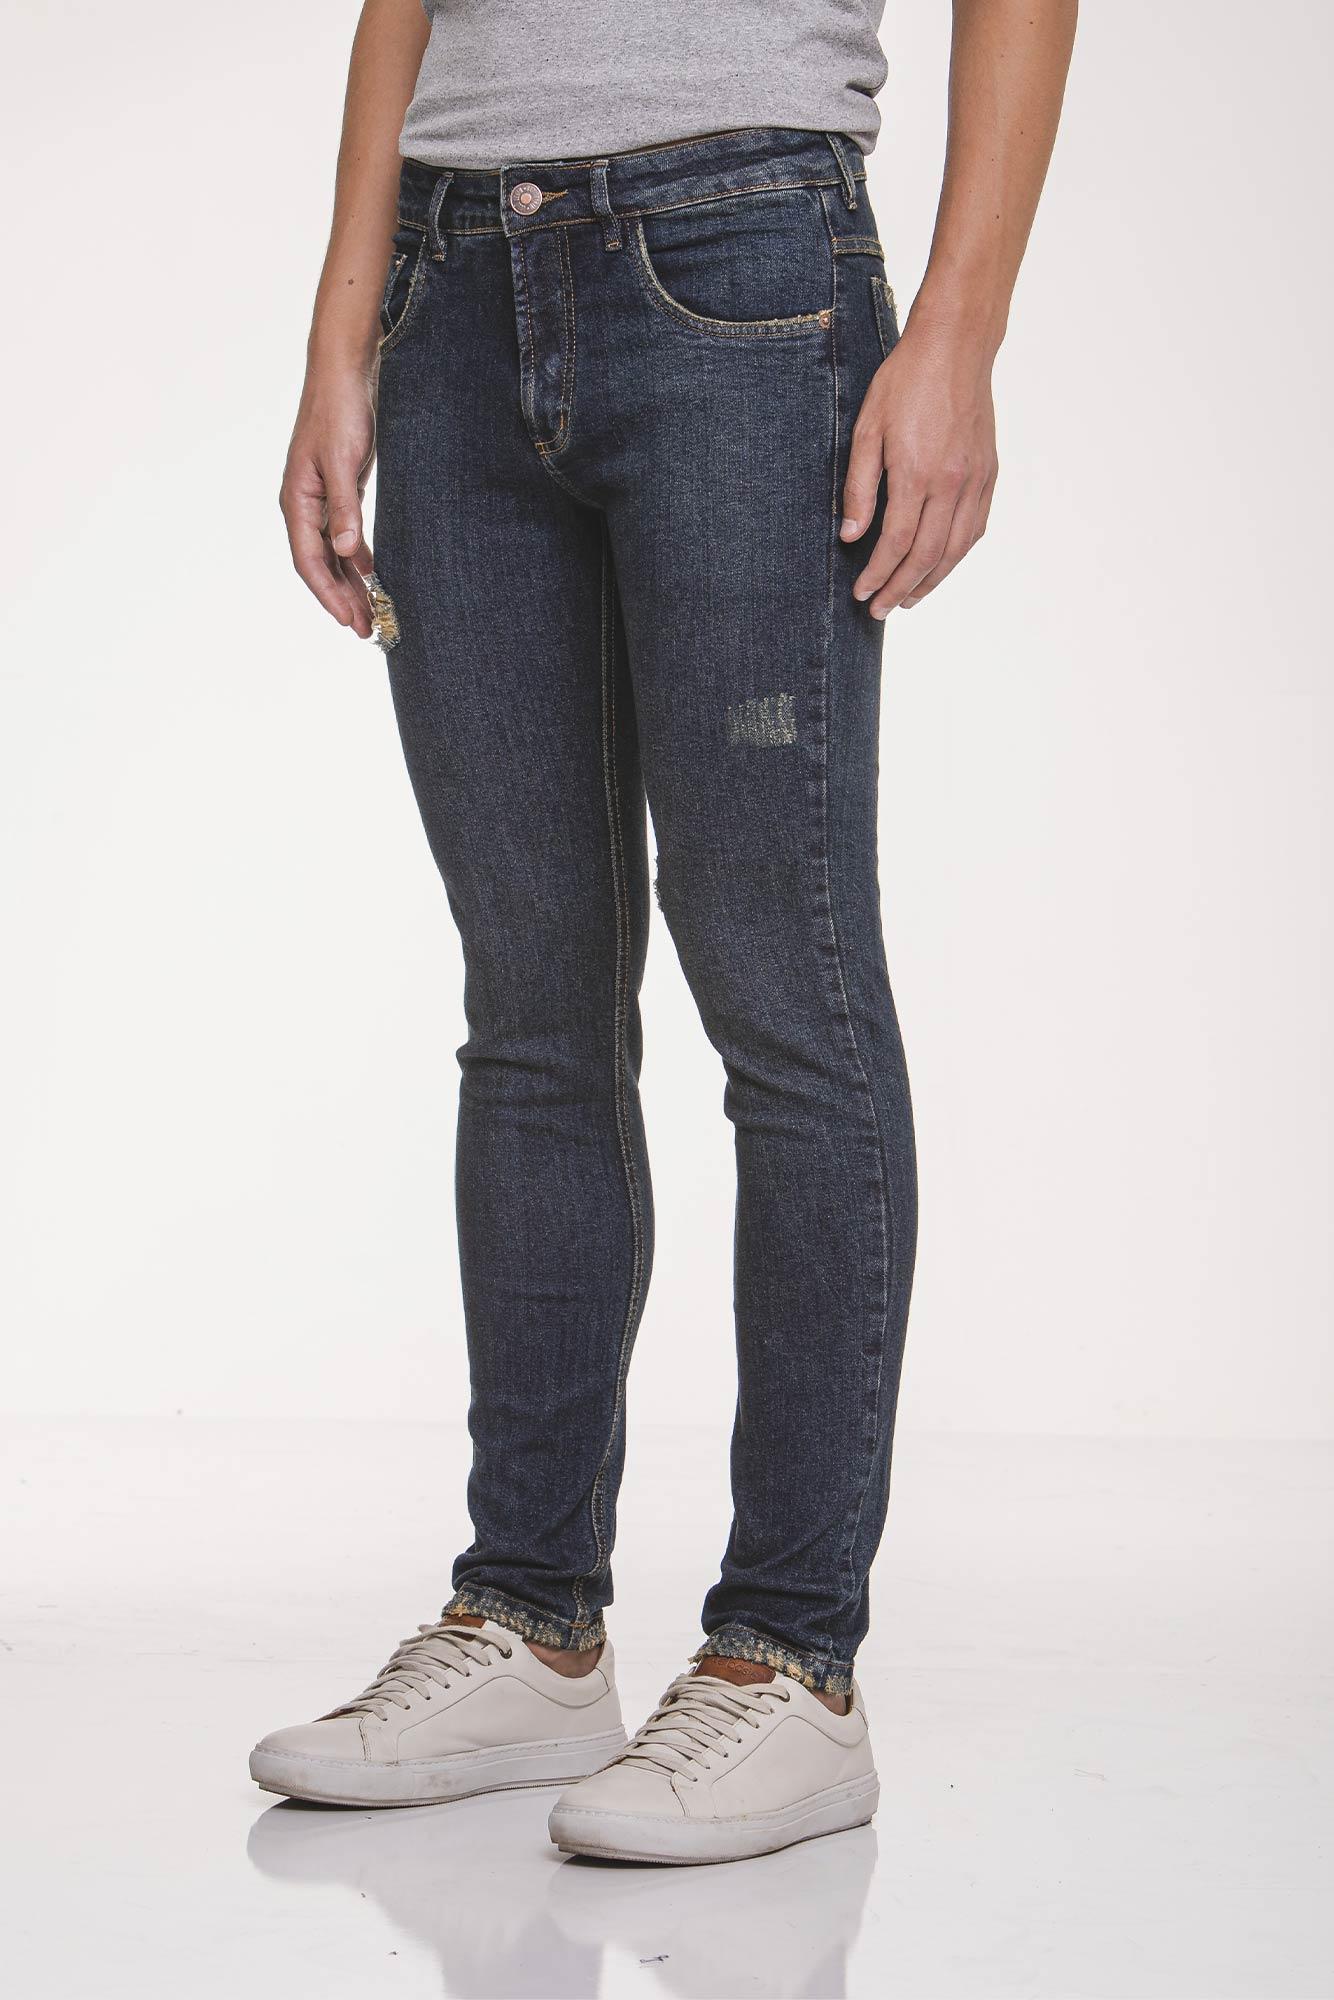 Calça Jeans Sarja Destroyed